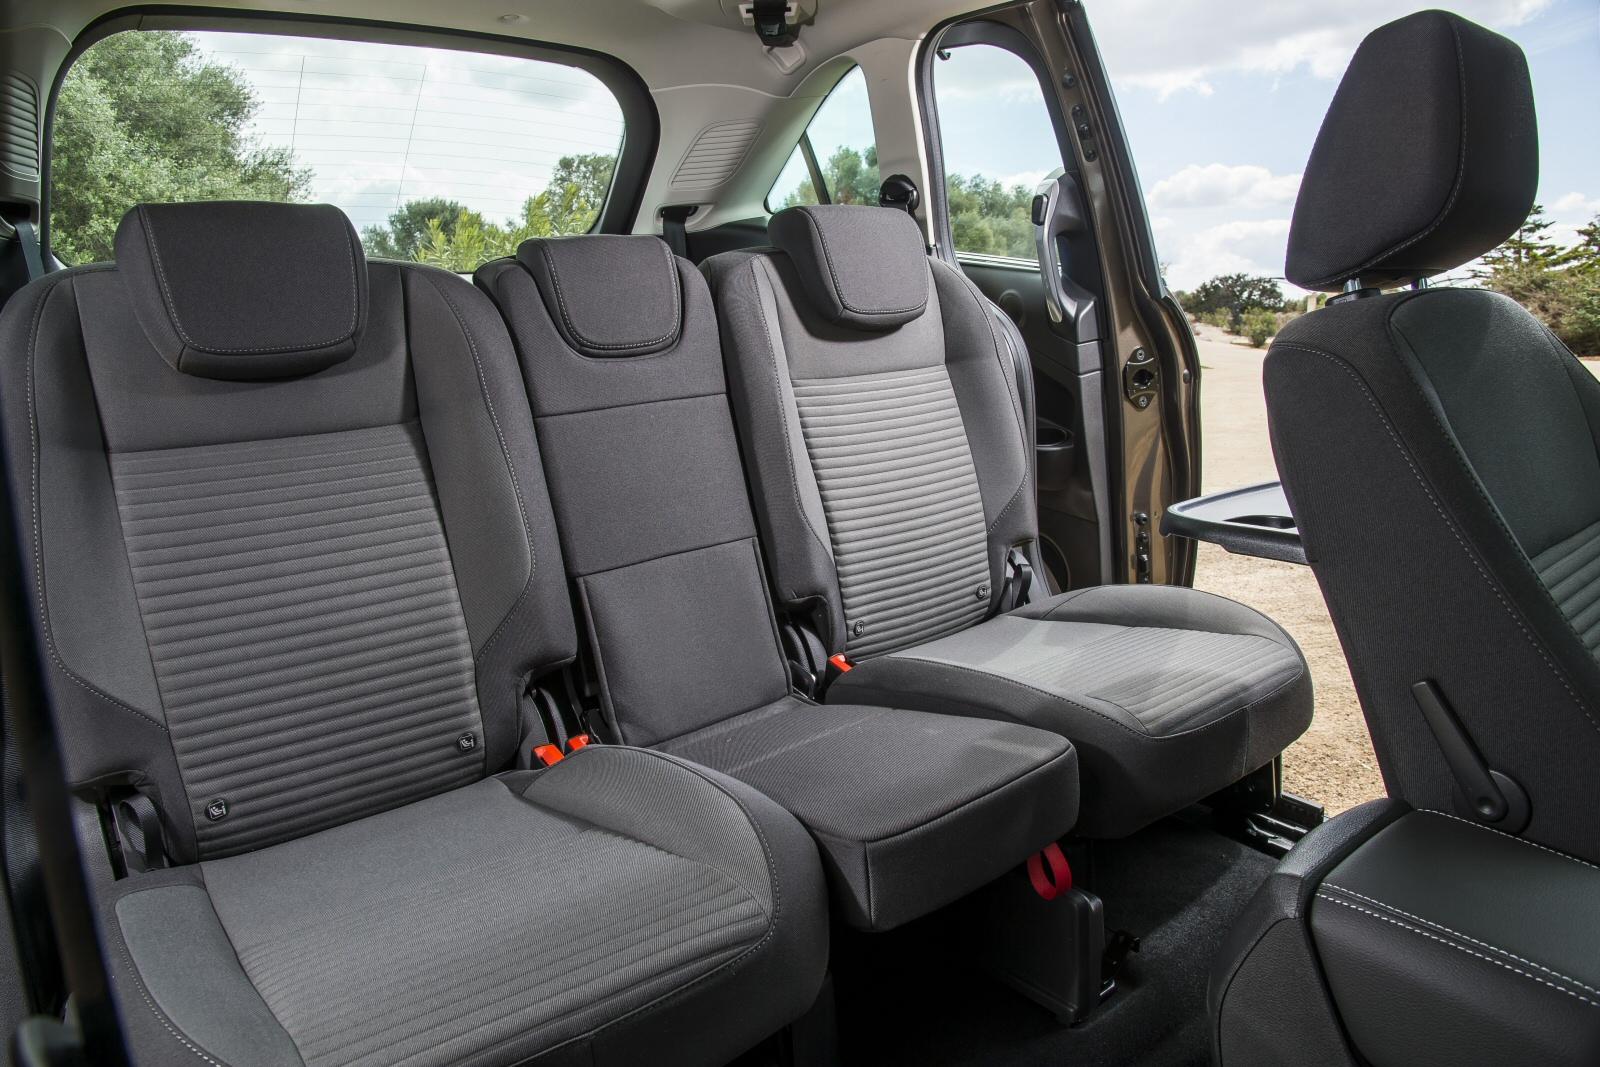 New Ford Grand C-MAX 1.0 Ecoboost Zetec 5Dr Petrol Estate for Sale ...